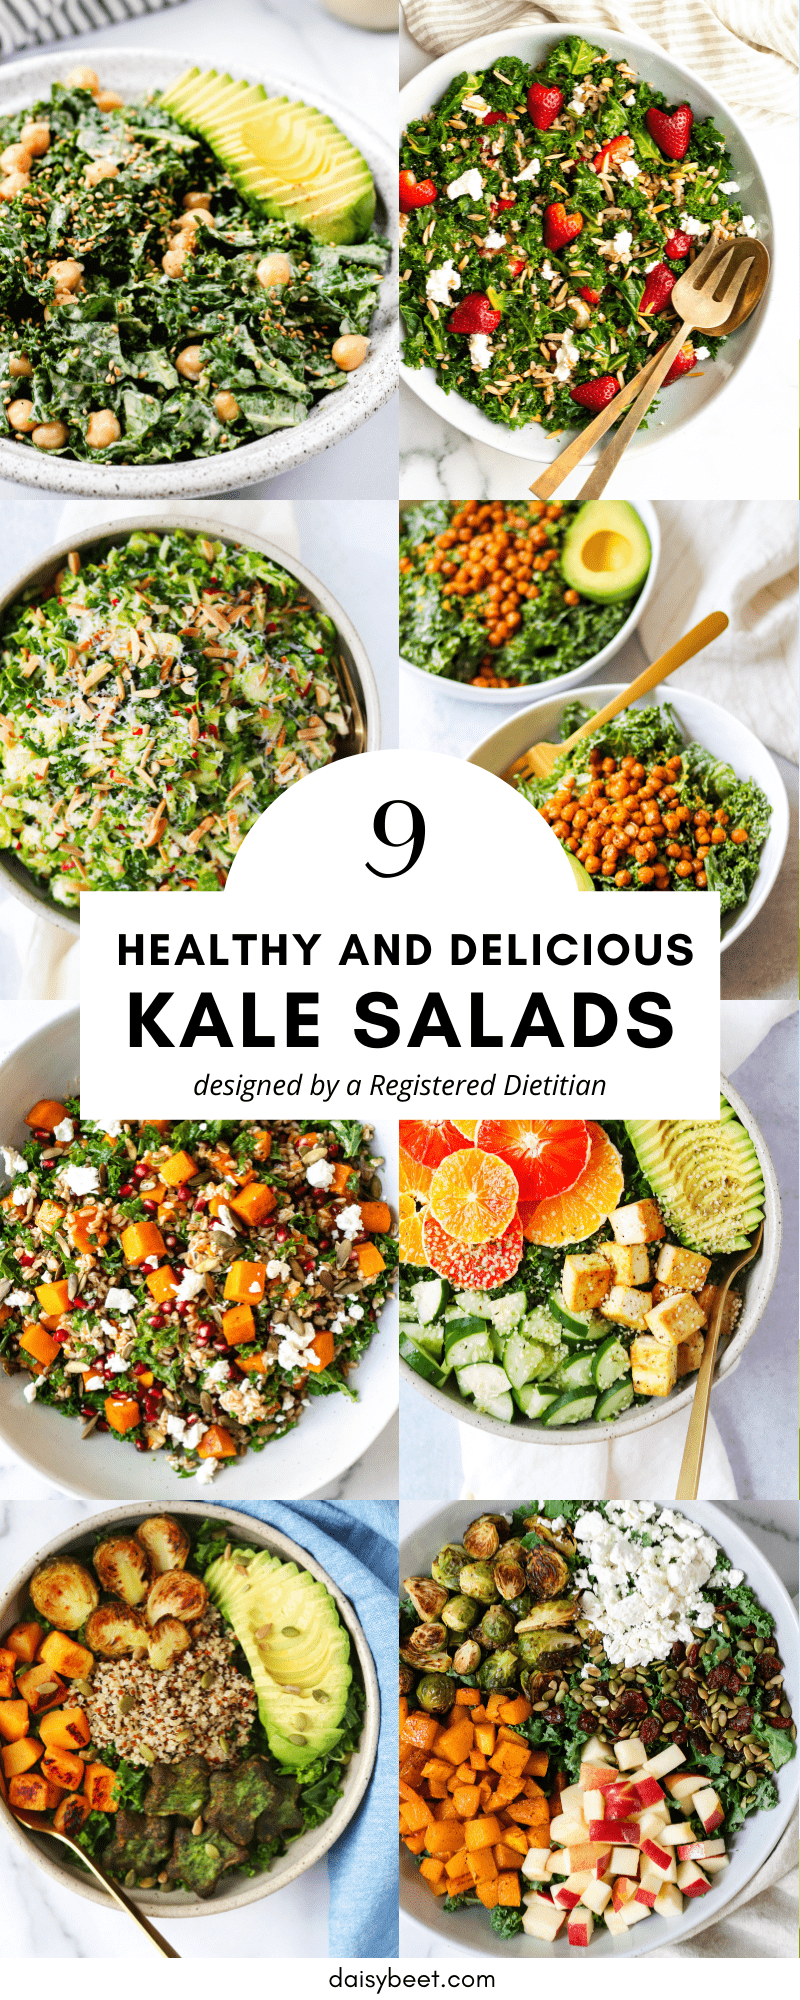 8 different kale salad recipes